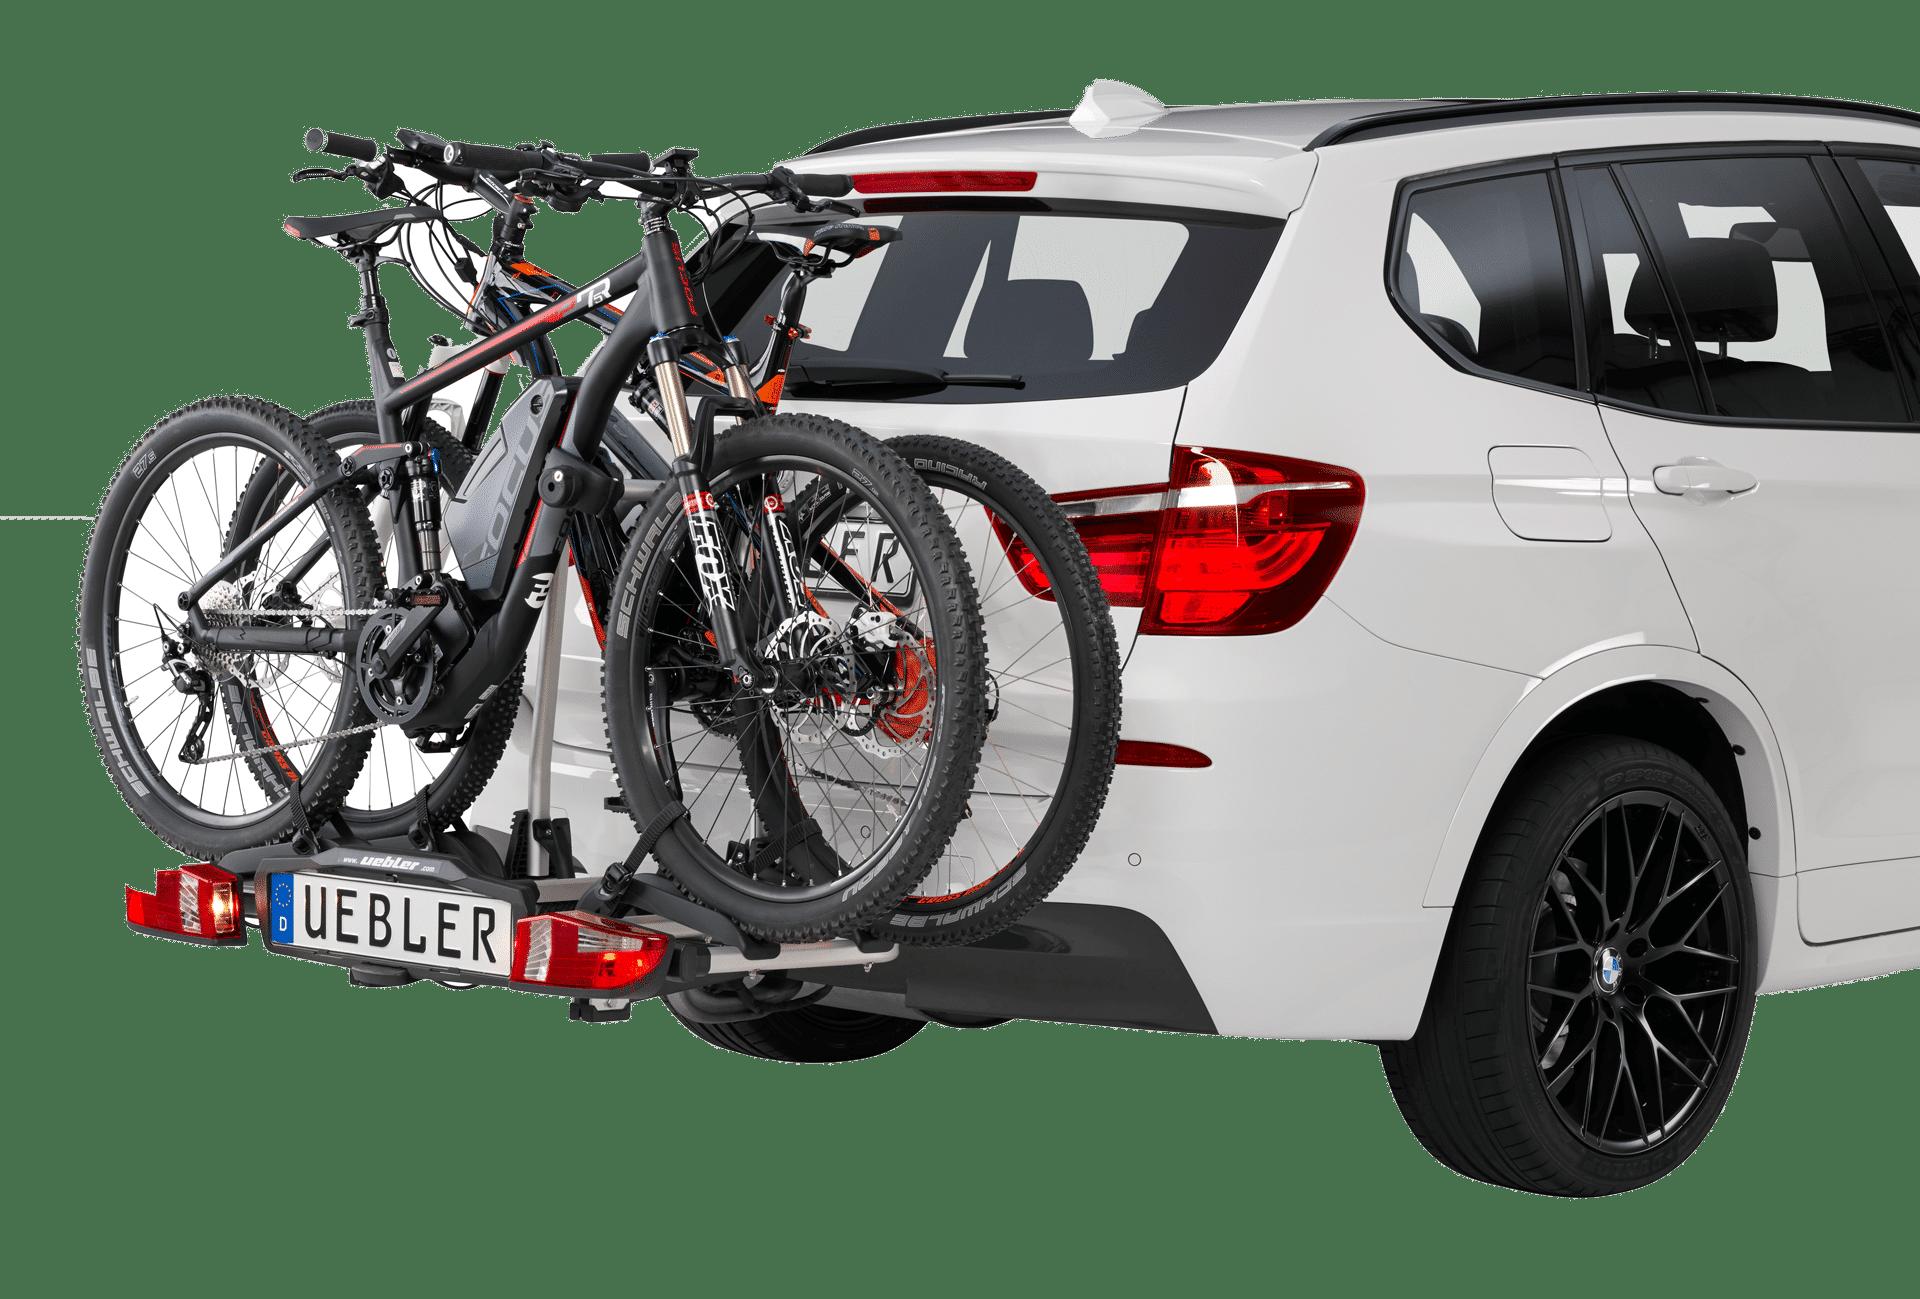 Fahrradträger Uebler Thierberg Anhänger Fachmarkt